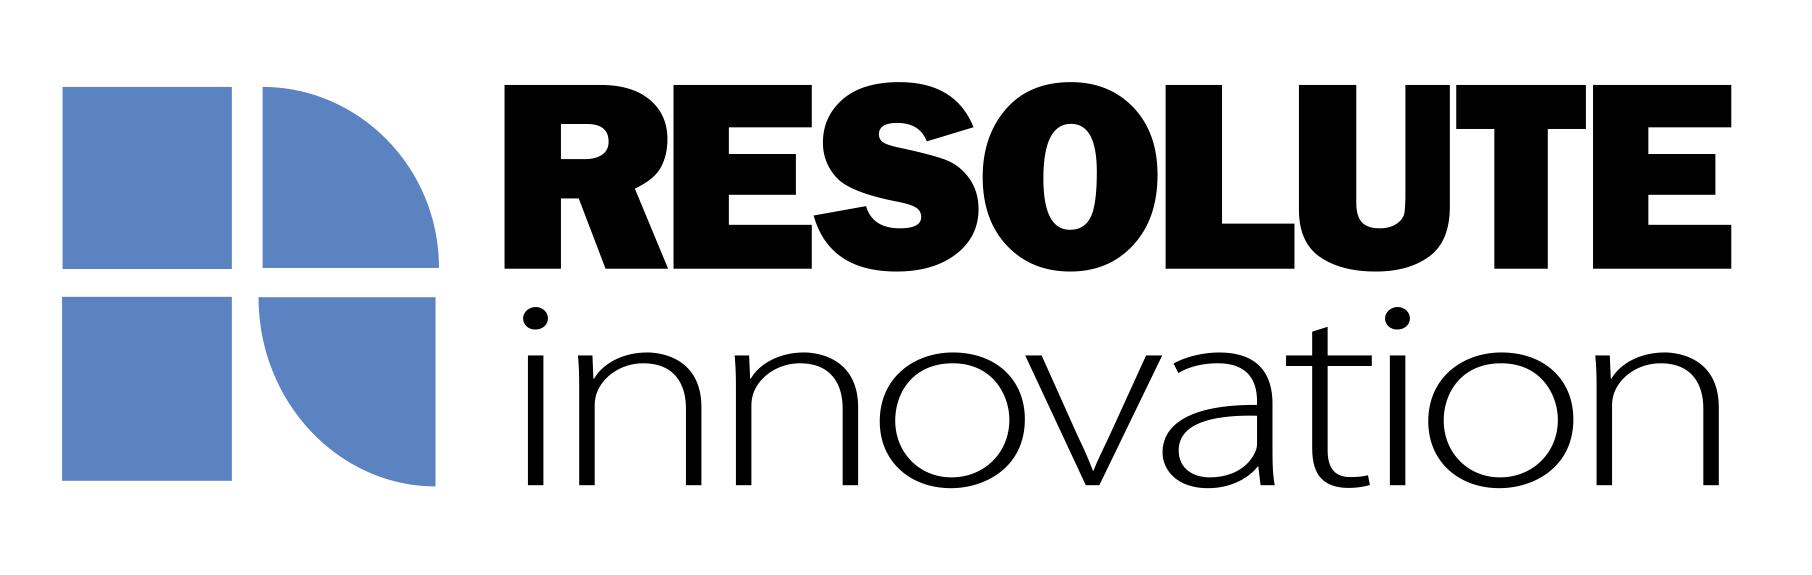 Resolute Innovation